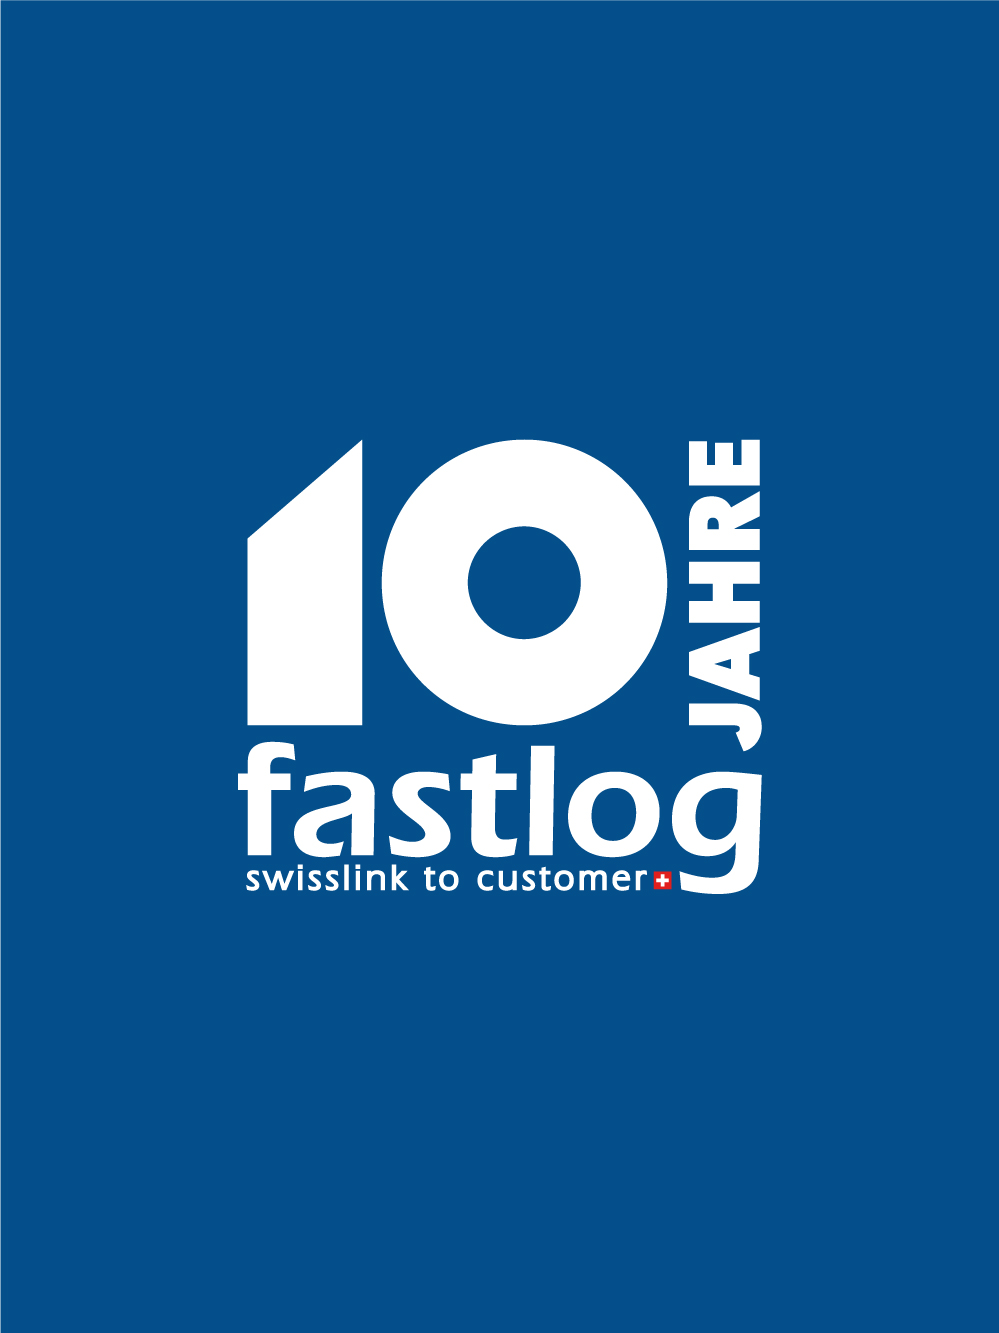 Fastlog 10 Jahre logo by GPU Design